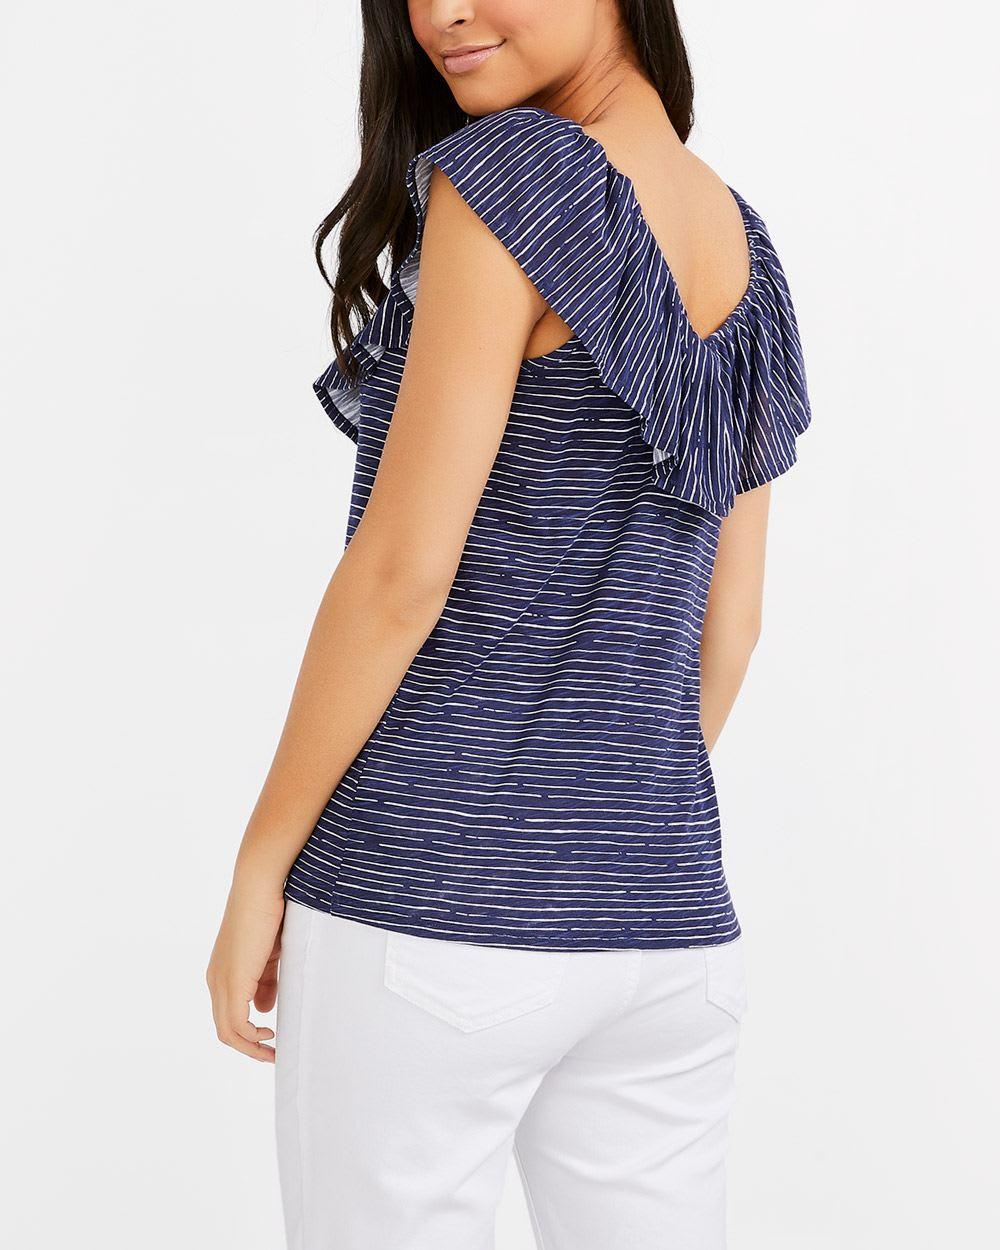 Ruffle V-Neck Striped Top